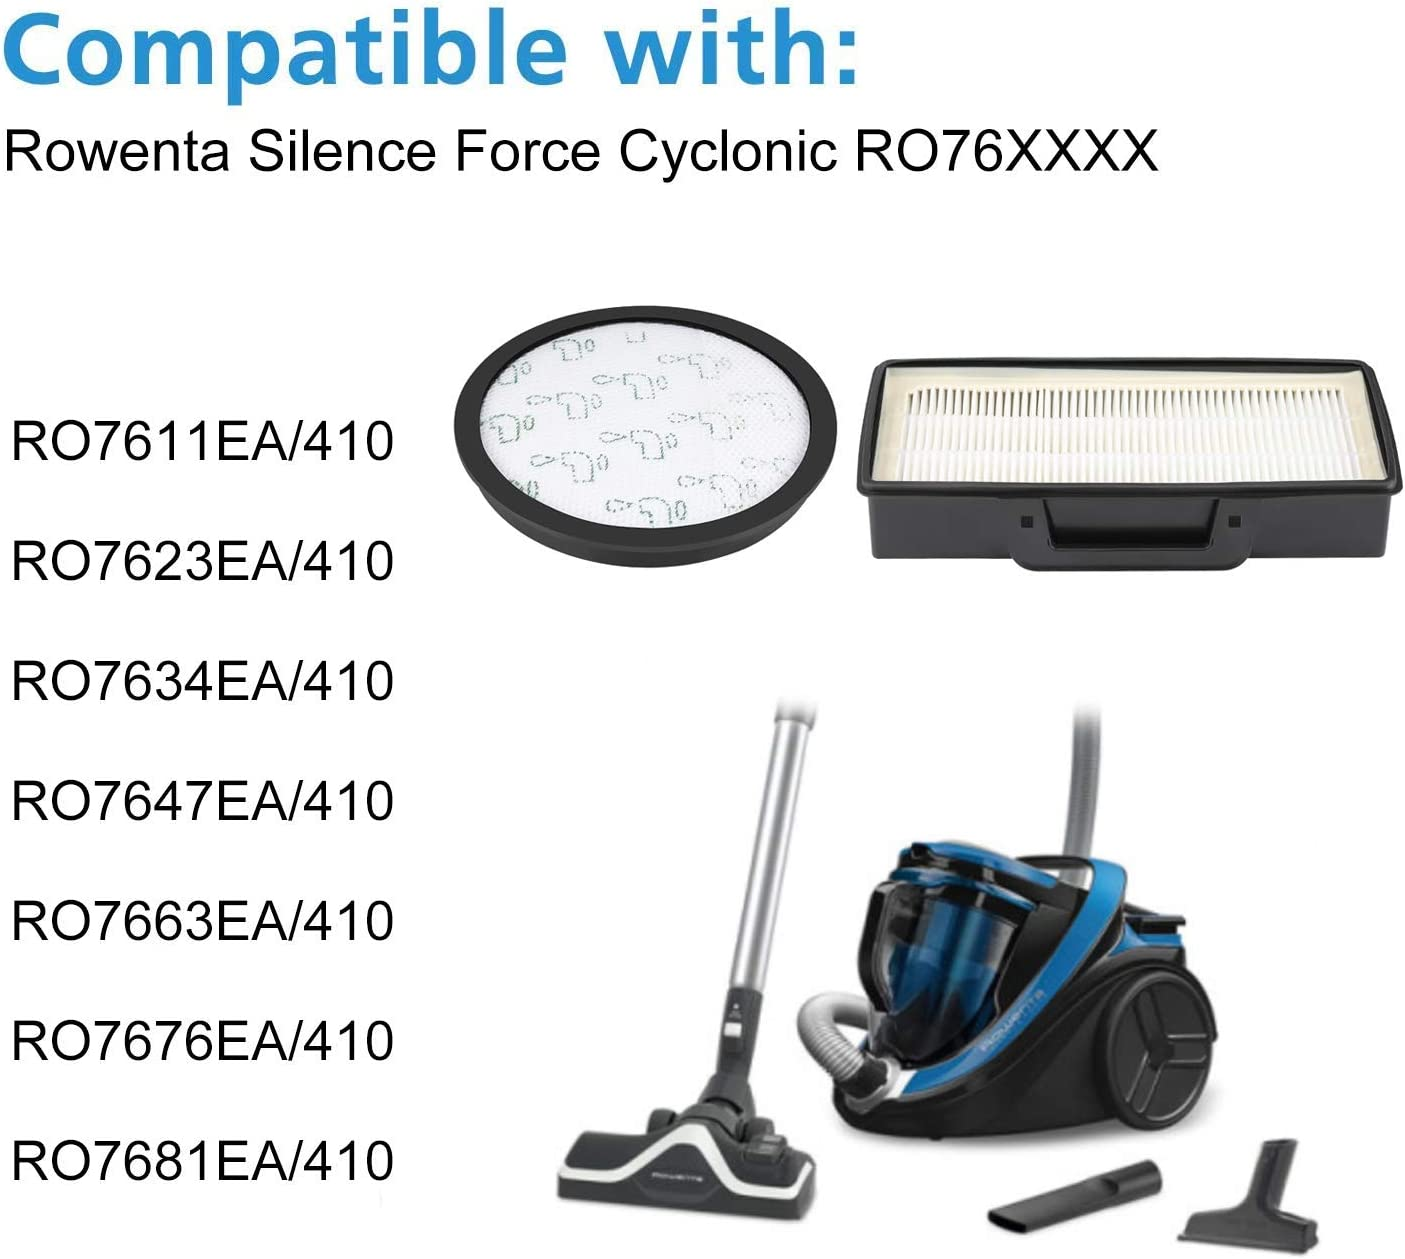 Isincer Paquete de 4 Kits 2 Caja de Filtro HEPA + 2 Esponjas Reemplazo de Filtro para Rowenta RO7611 RO7634 RO7623 Silence Force Aspiradora ciclónica, Comparar ZR903701: Amazon.es: Hogar